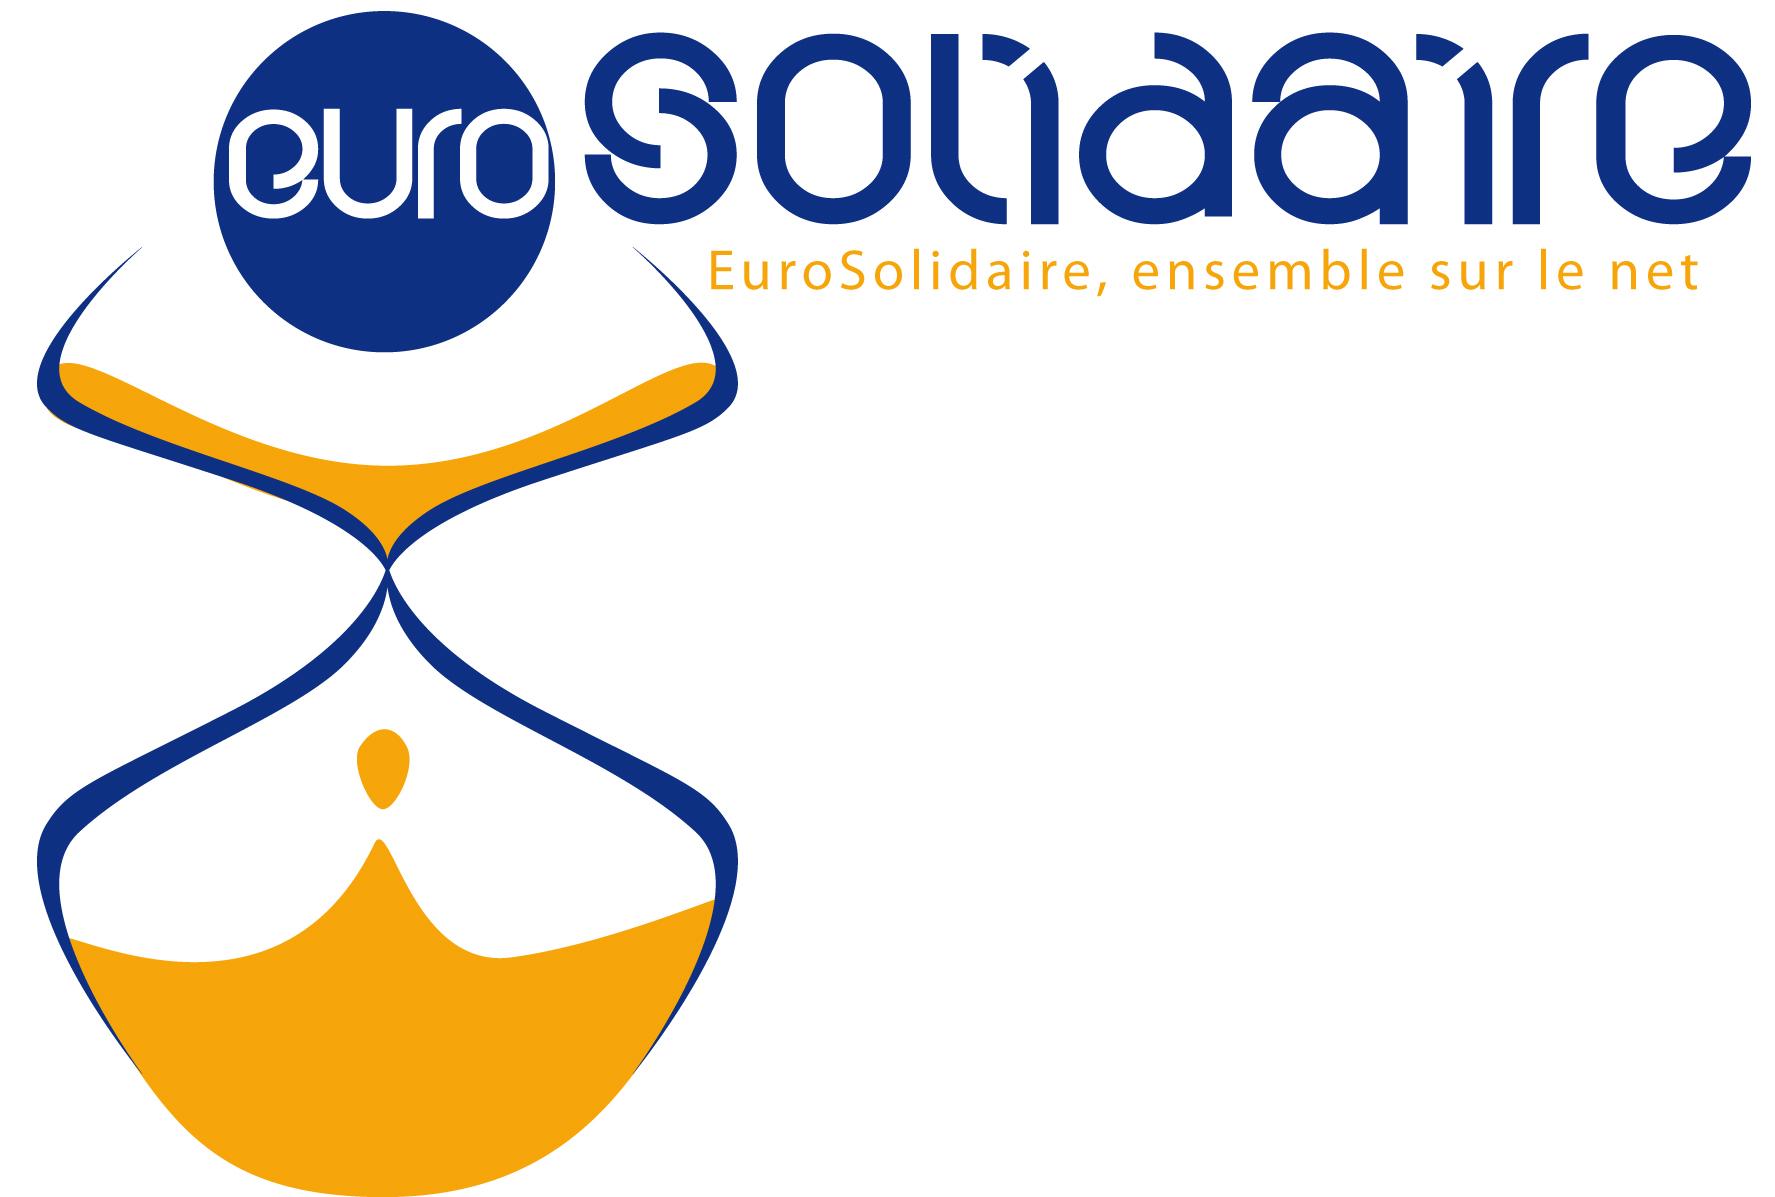 eurosolidaire-pres4-k.jpg